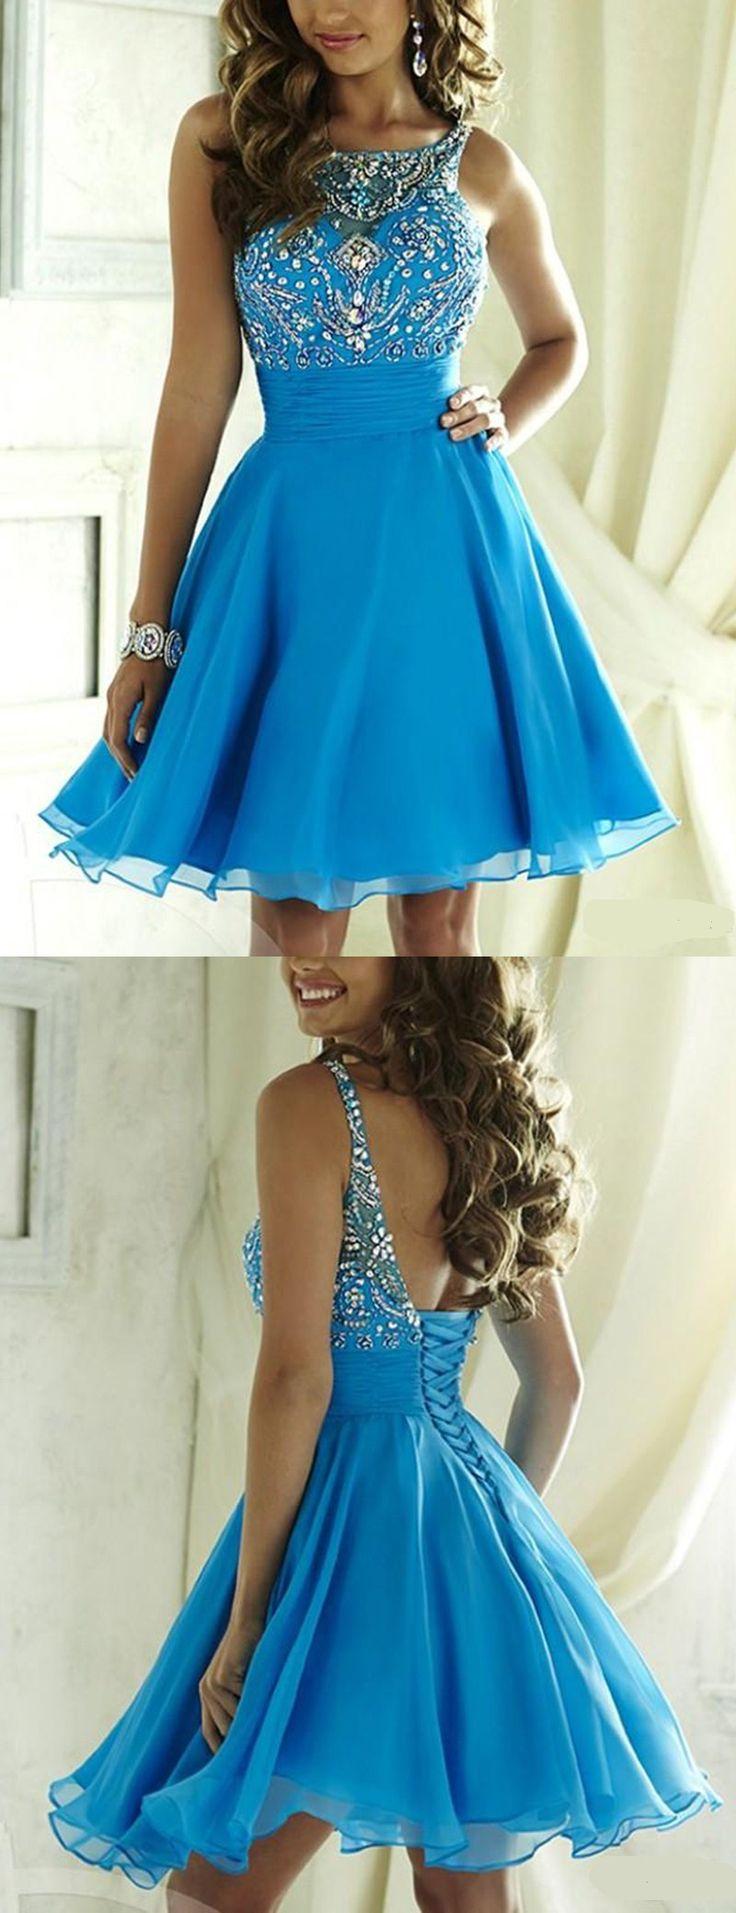 2016 homecoming dresses,homecoming dresses,short prom dresses,cheap homecoming dresses,junior homecoming dresses,baby blue homecoming dresses